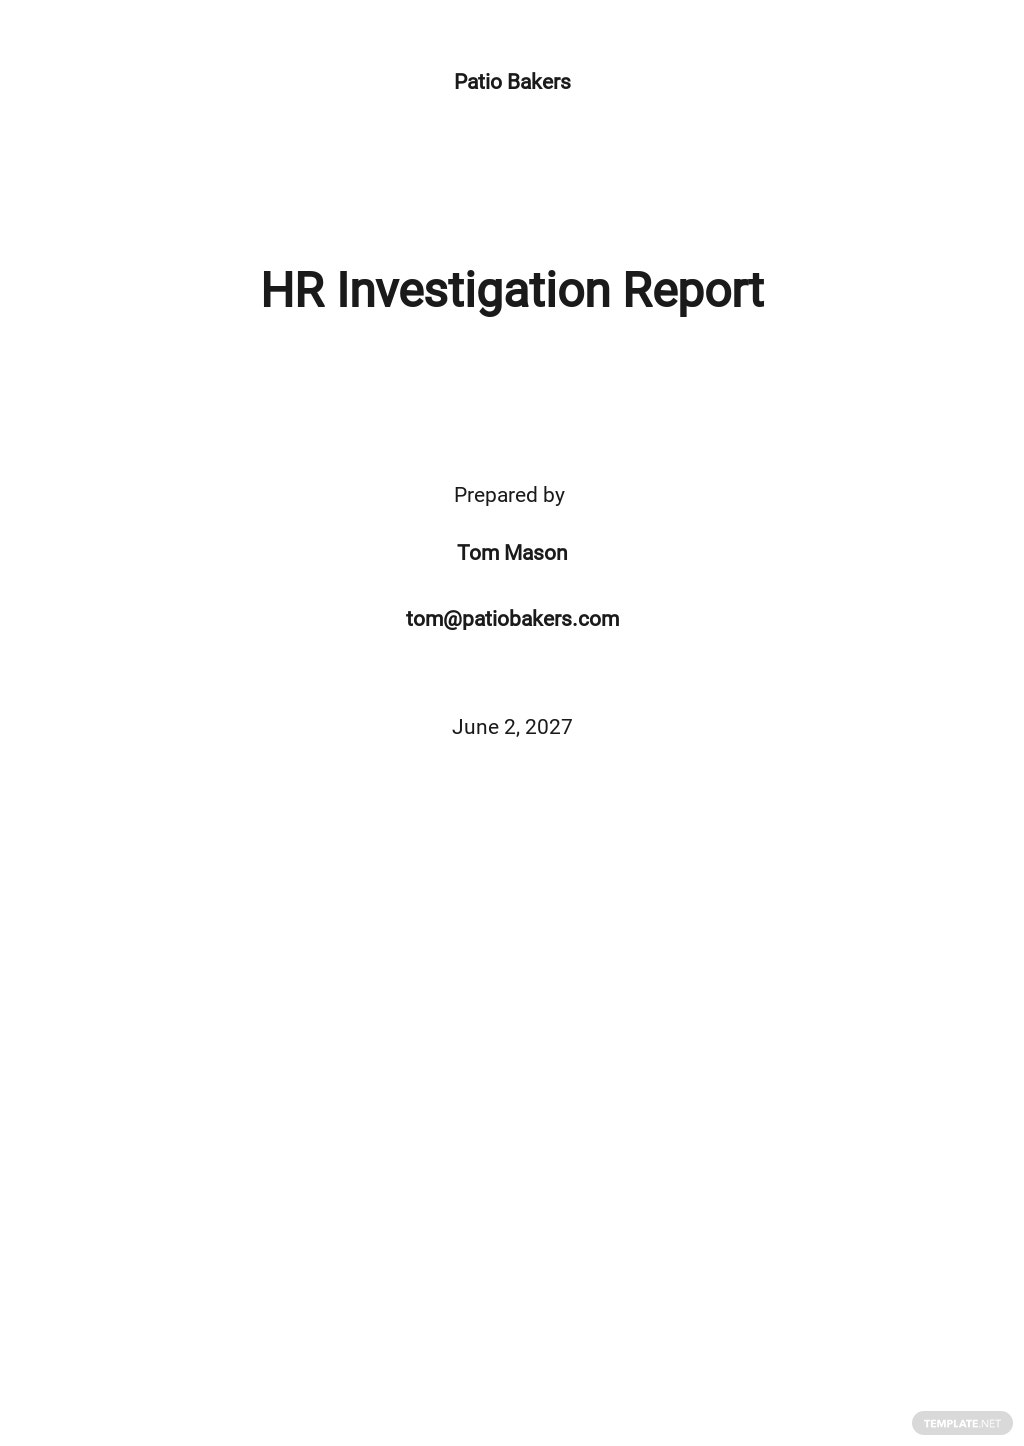 HR Investigation Report Template.jpe